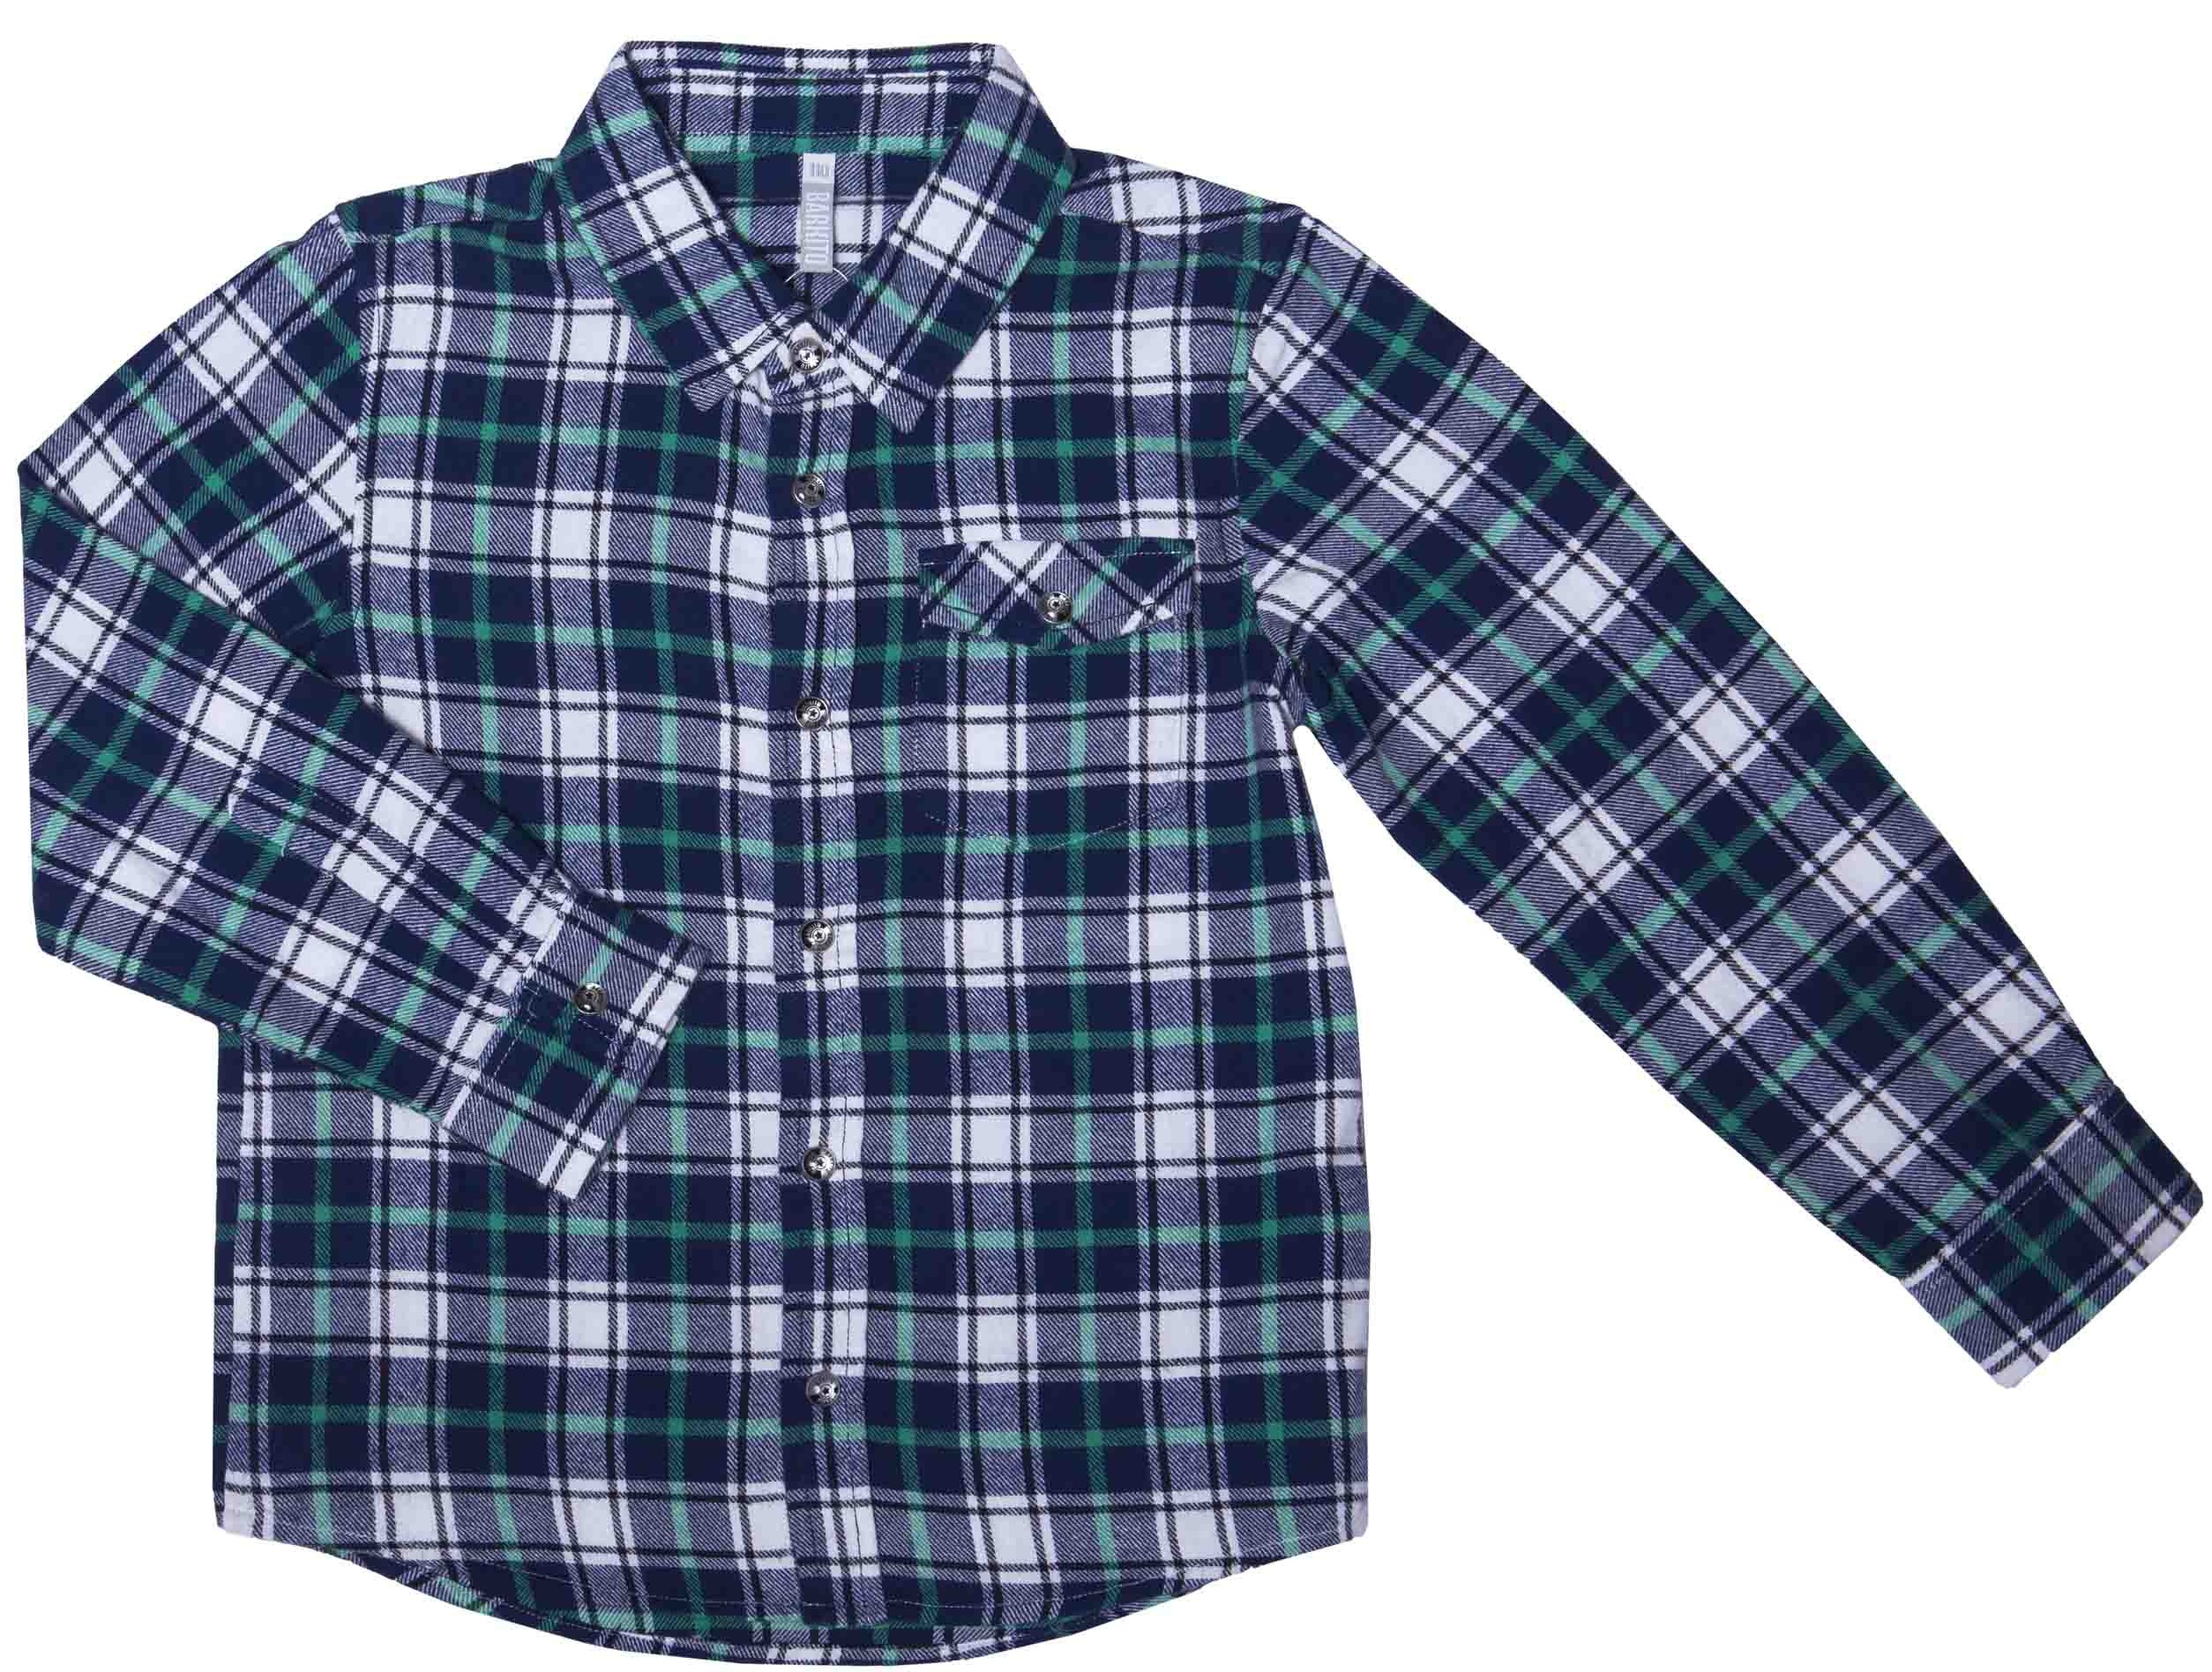 Купить Сорочка для мальчика, Сити, 1шт., Barkito W16B4004S(1), Китай, синий с рисунком клетка , Мужской